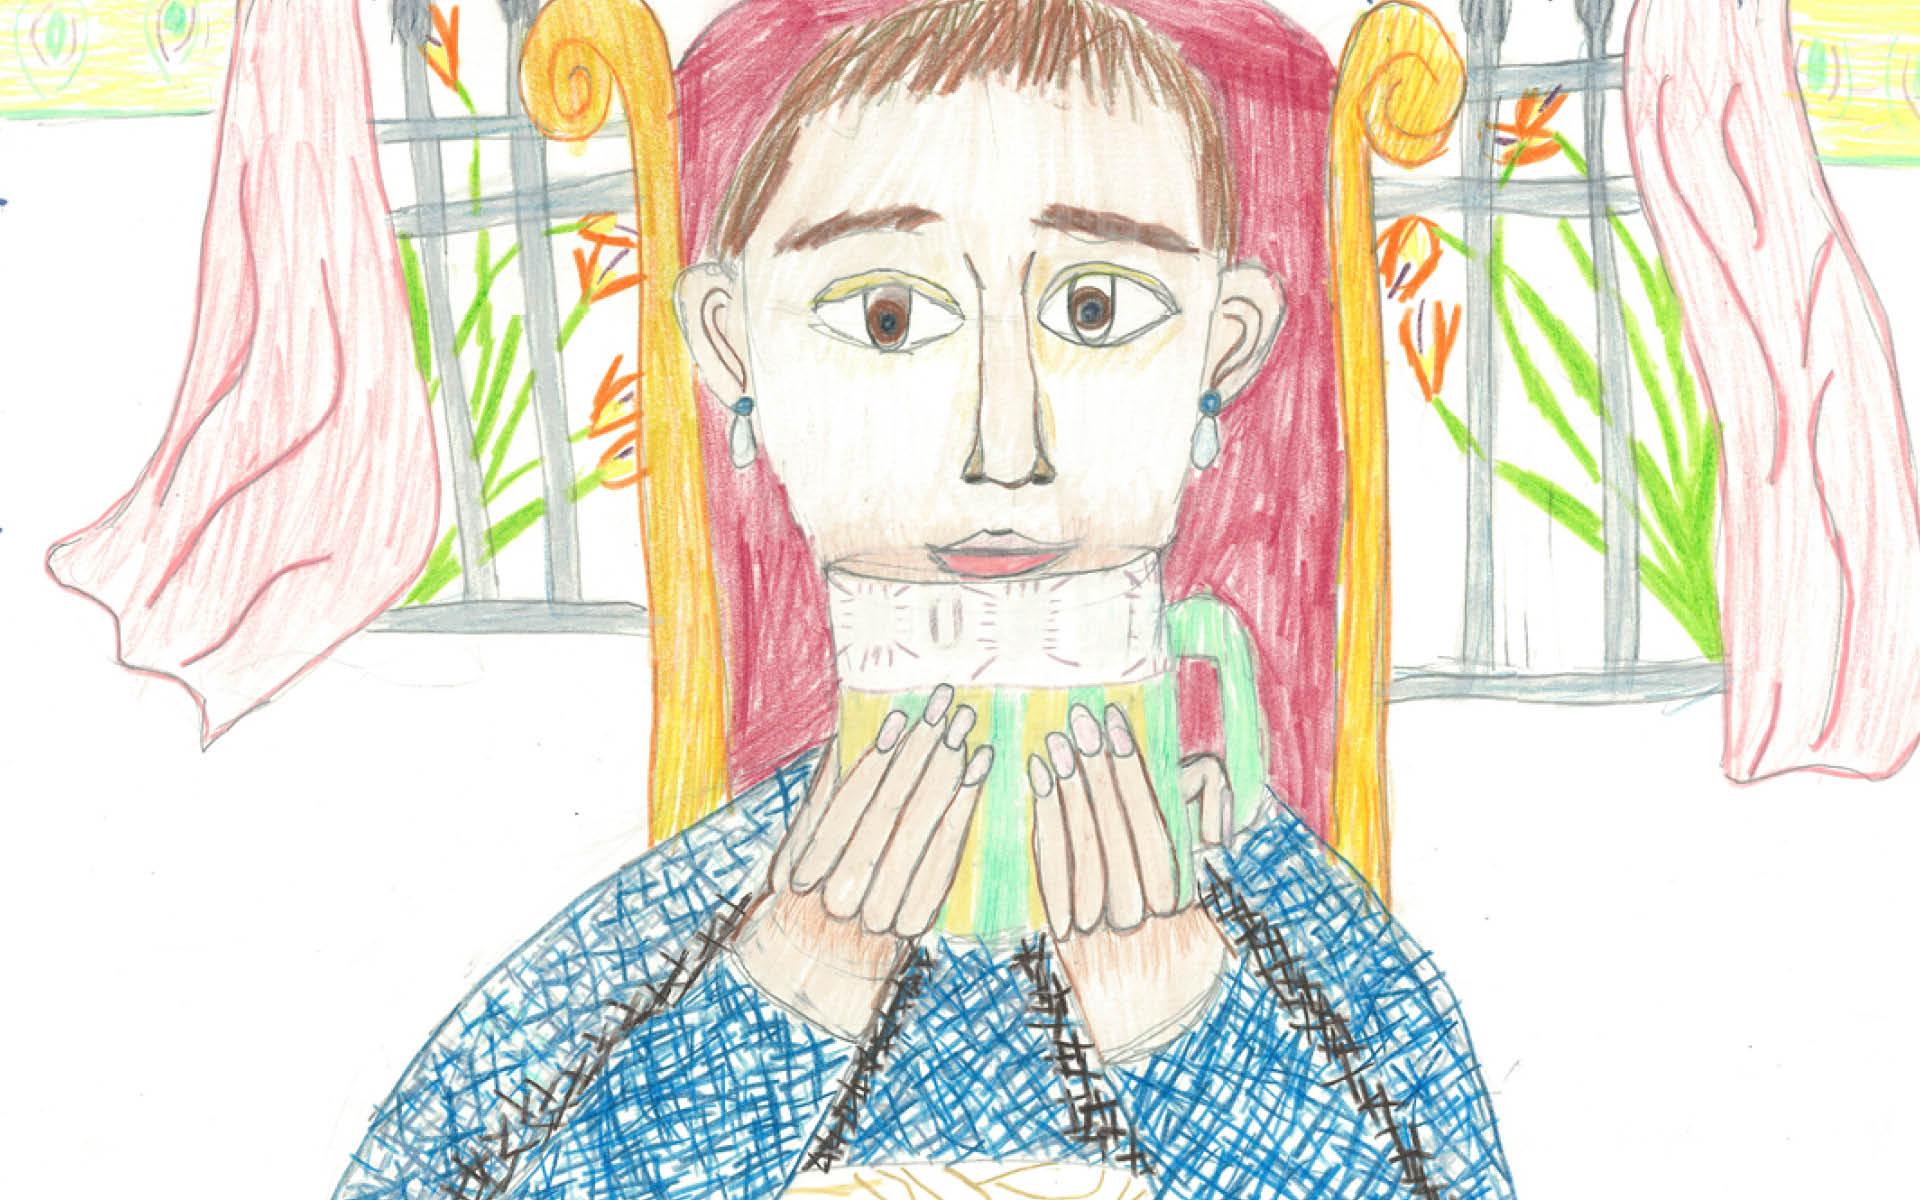 artist's prayer, architect on demand, advice without strings, DIY Like a Hummingbird